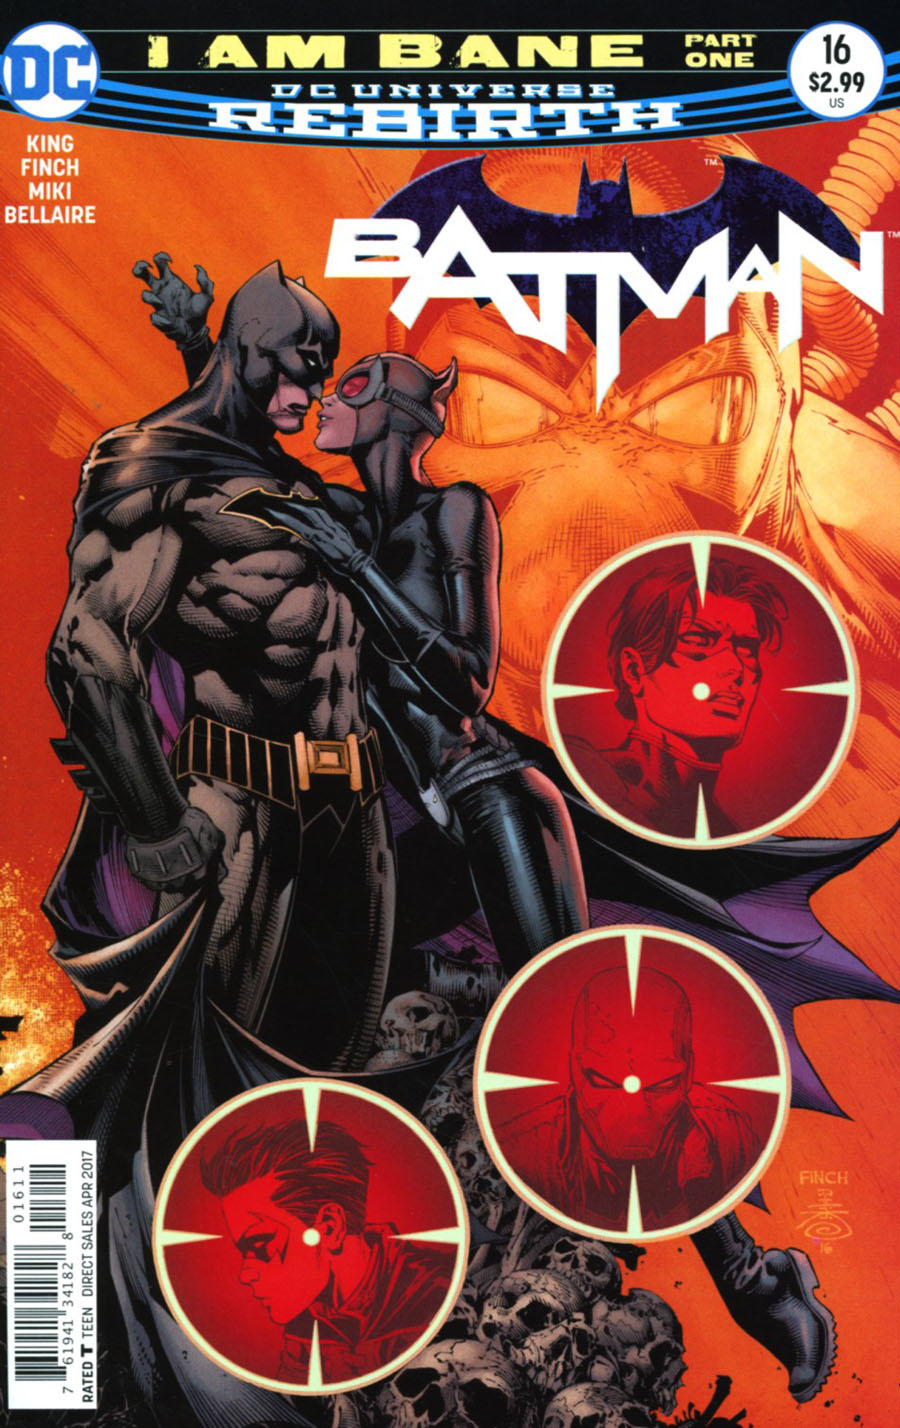 Every Day Is Like Wednesday: Comic Shop Comics: February 1st